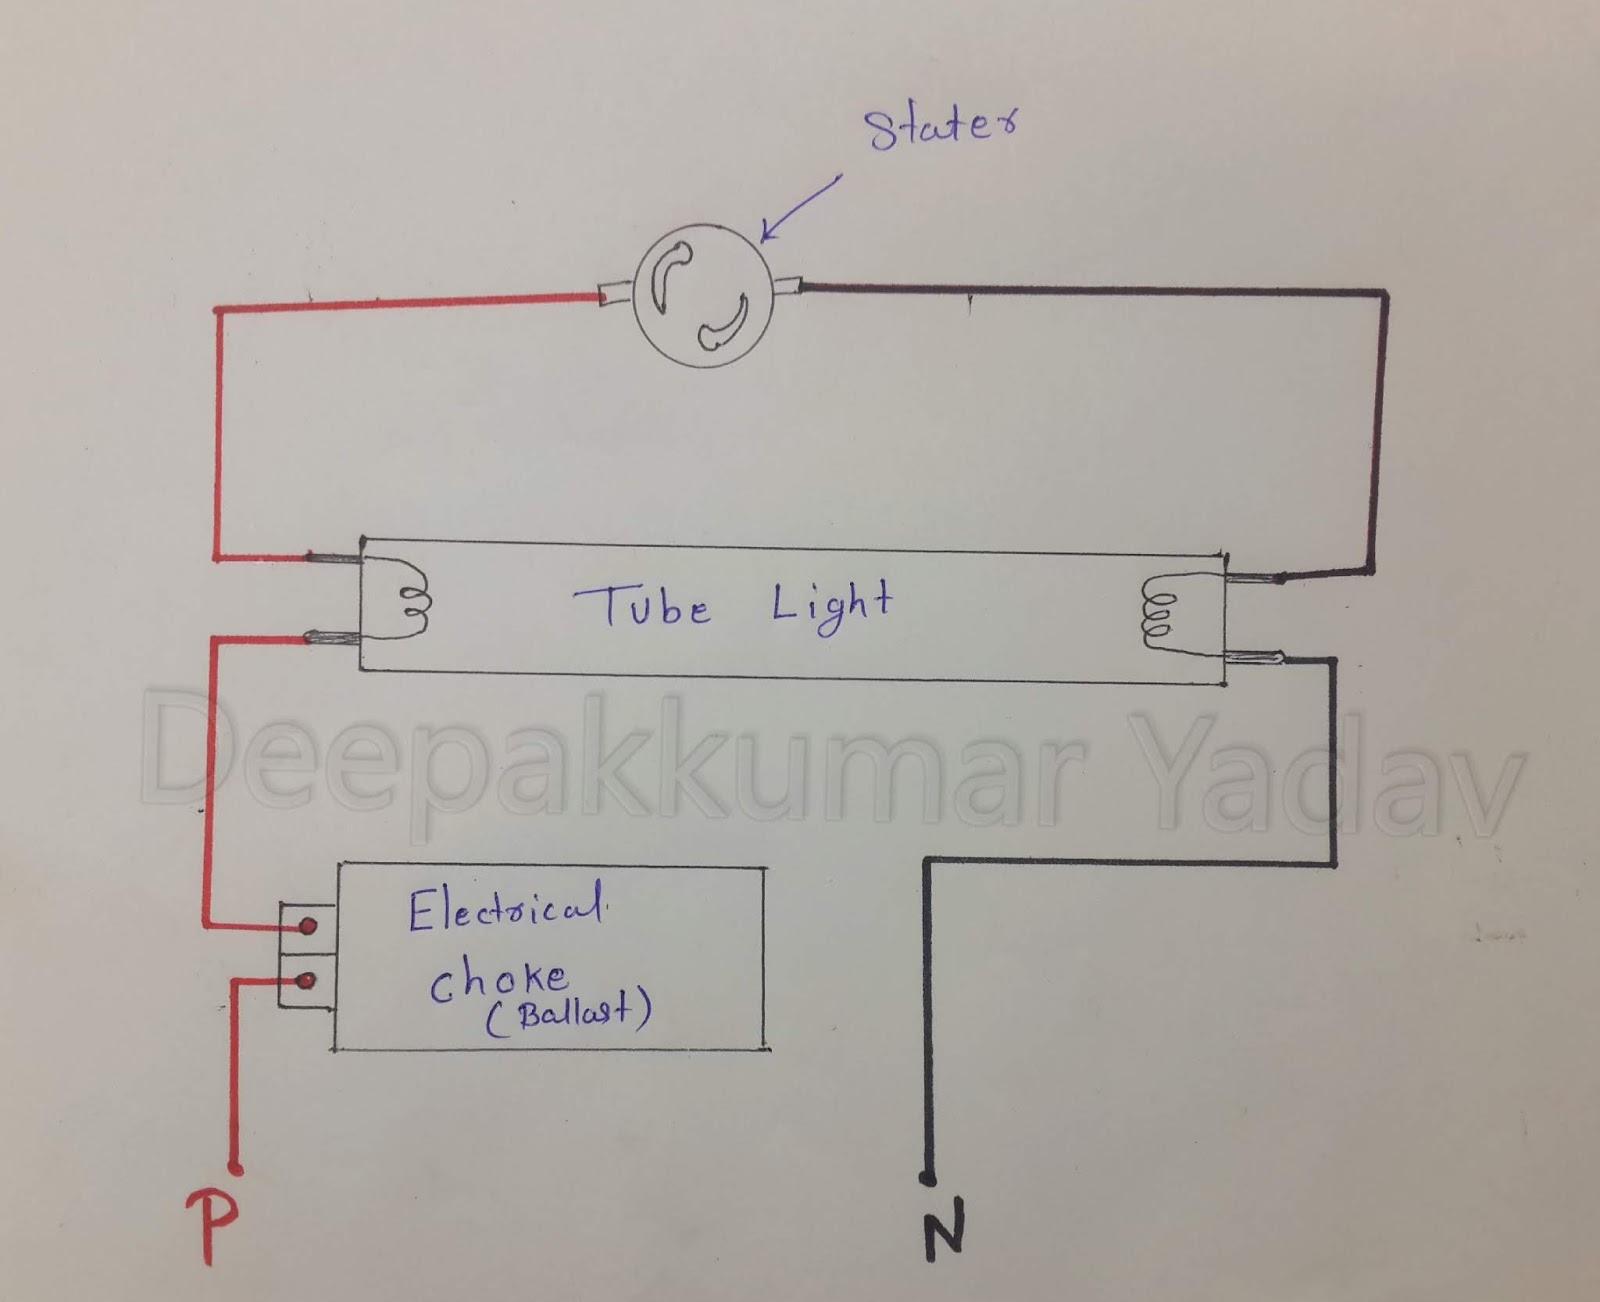 Deepakkumar Yadav  How Does A Fluorescent Tube Light Work And How Starter Work  In Hindi